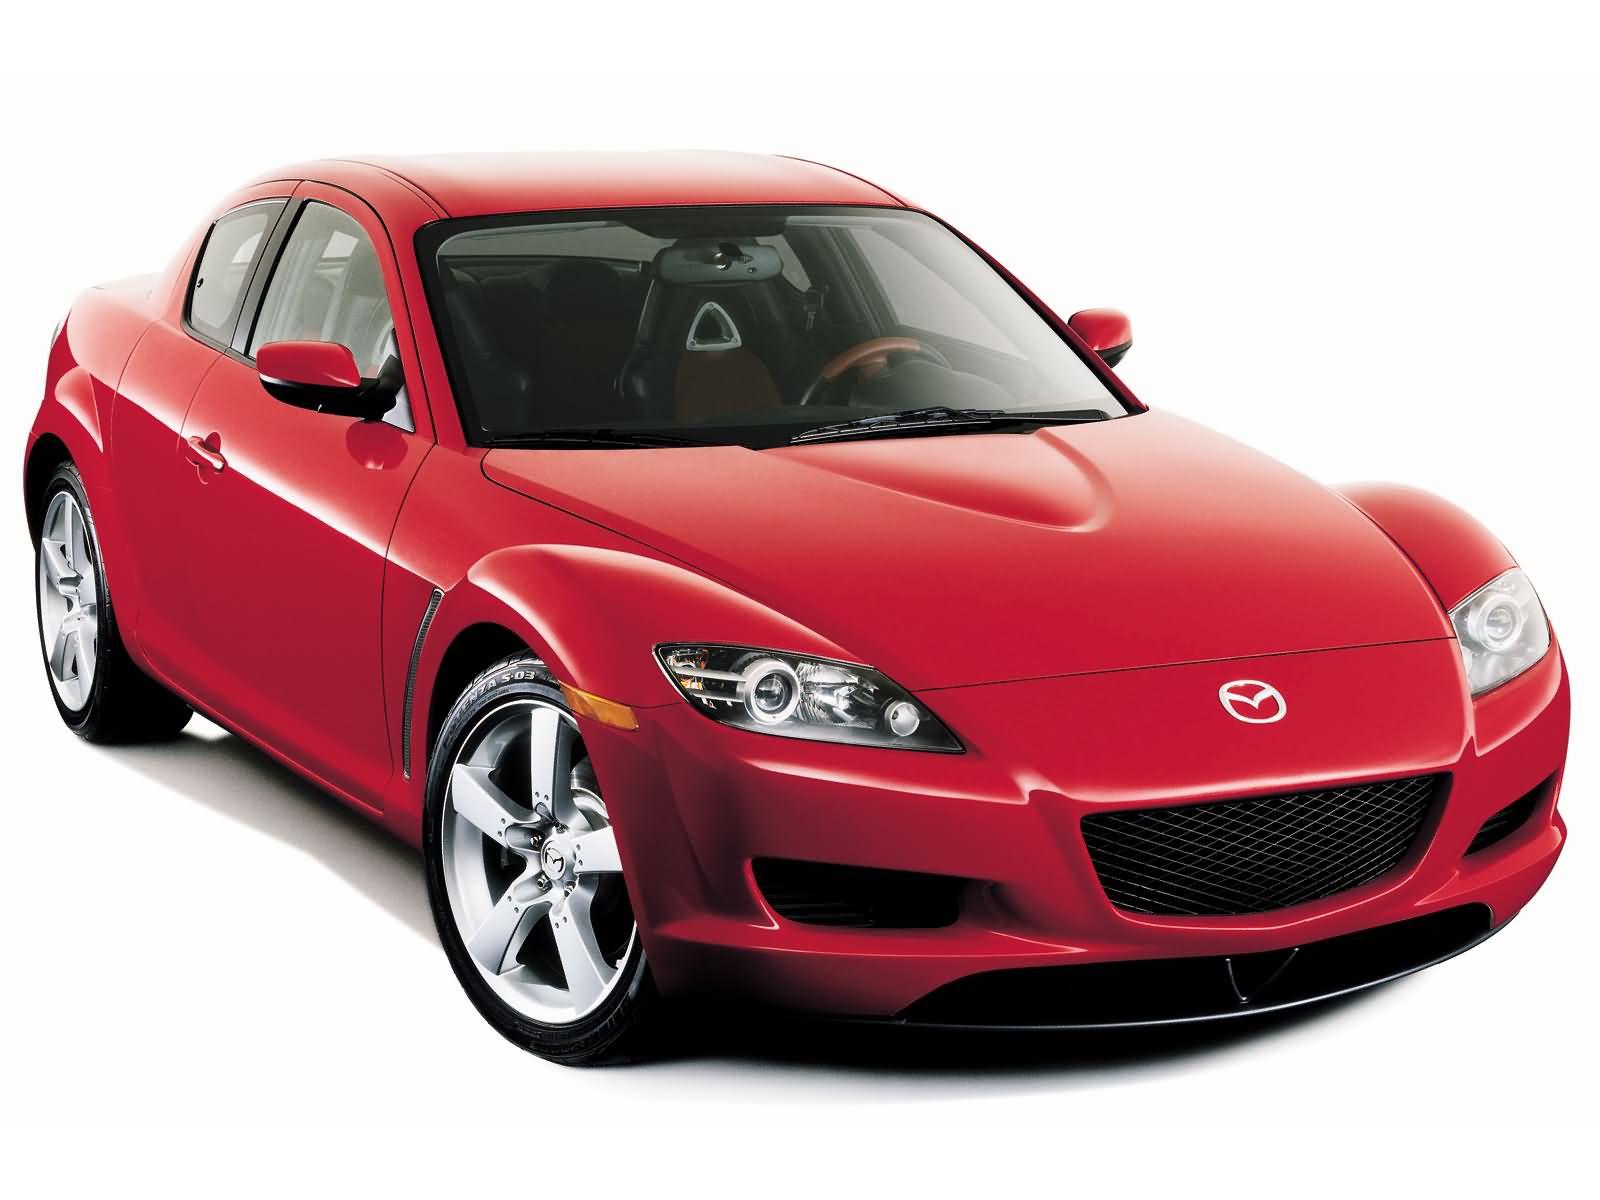 http://www.carsbase.com/photo/Mazda-RX_8_mp34_pic_3435.jpg